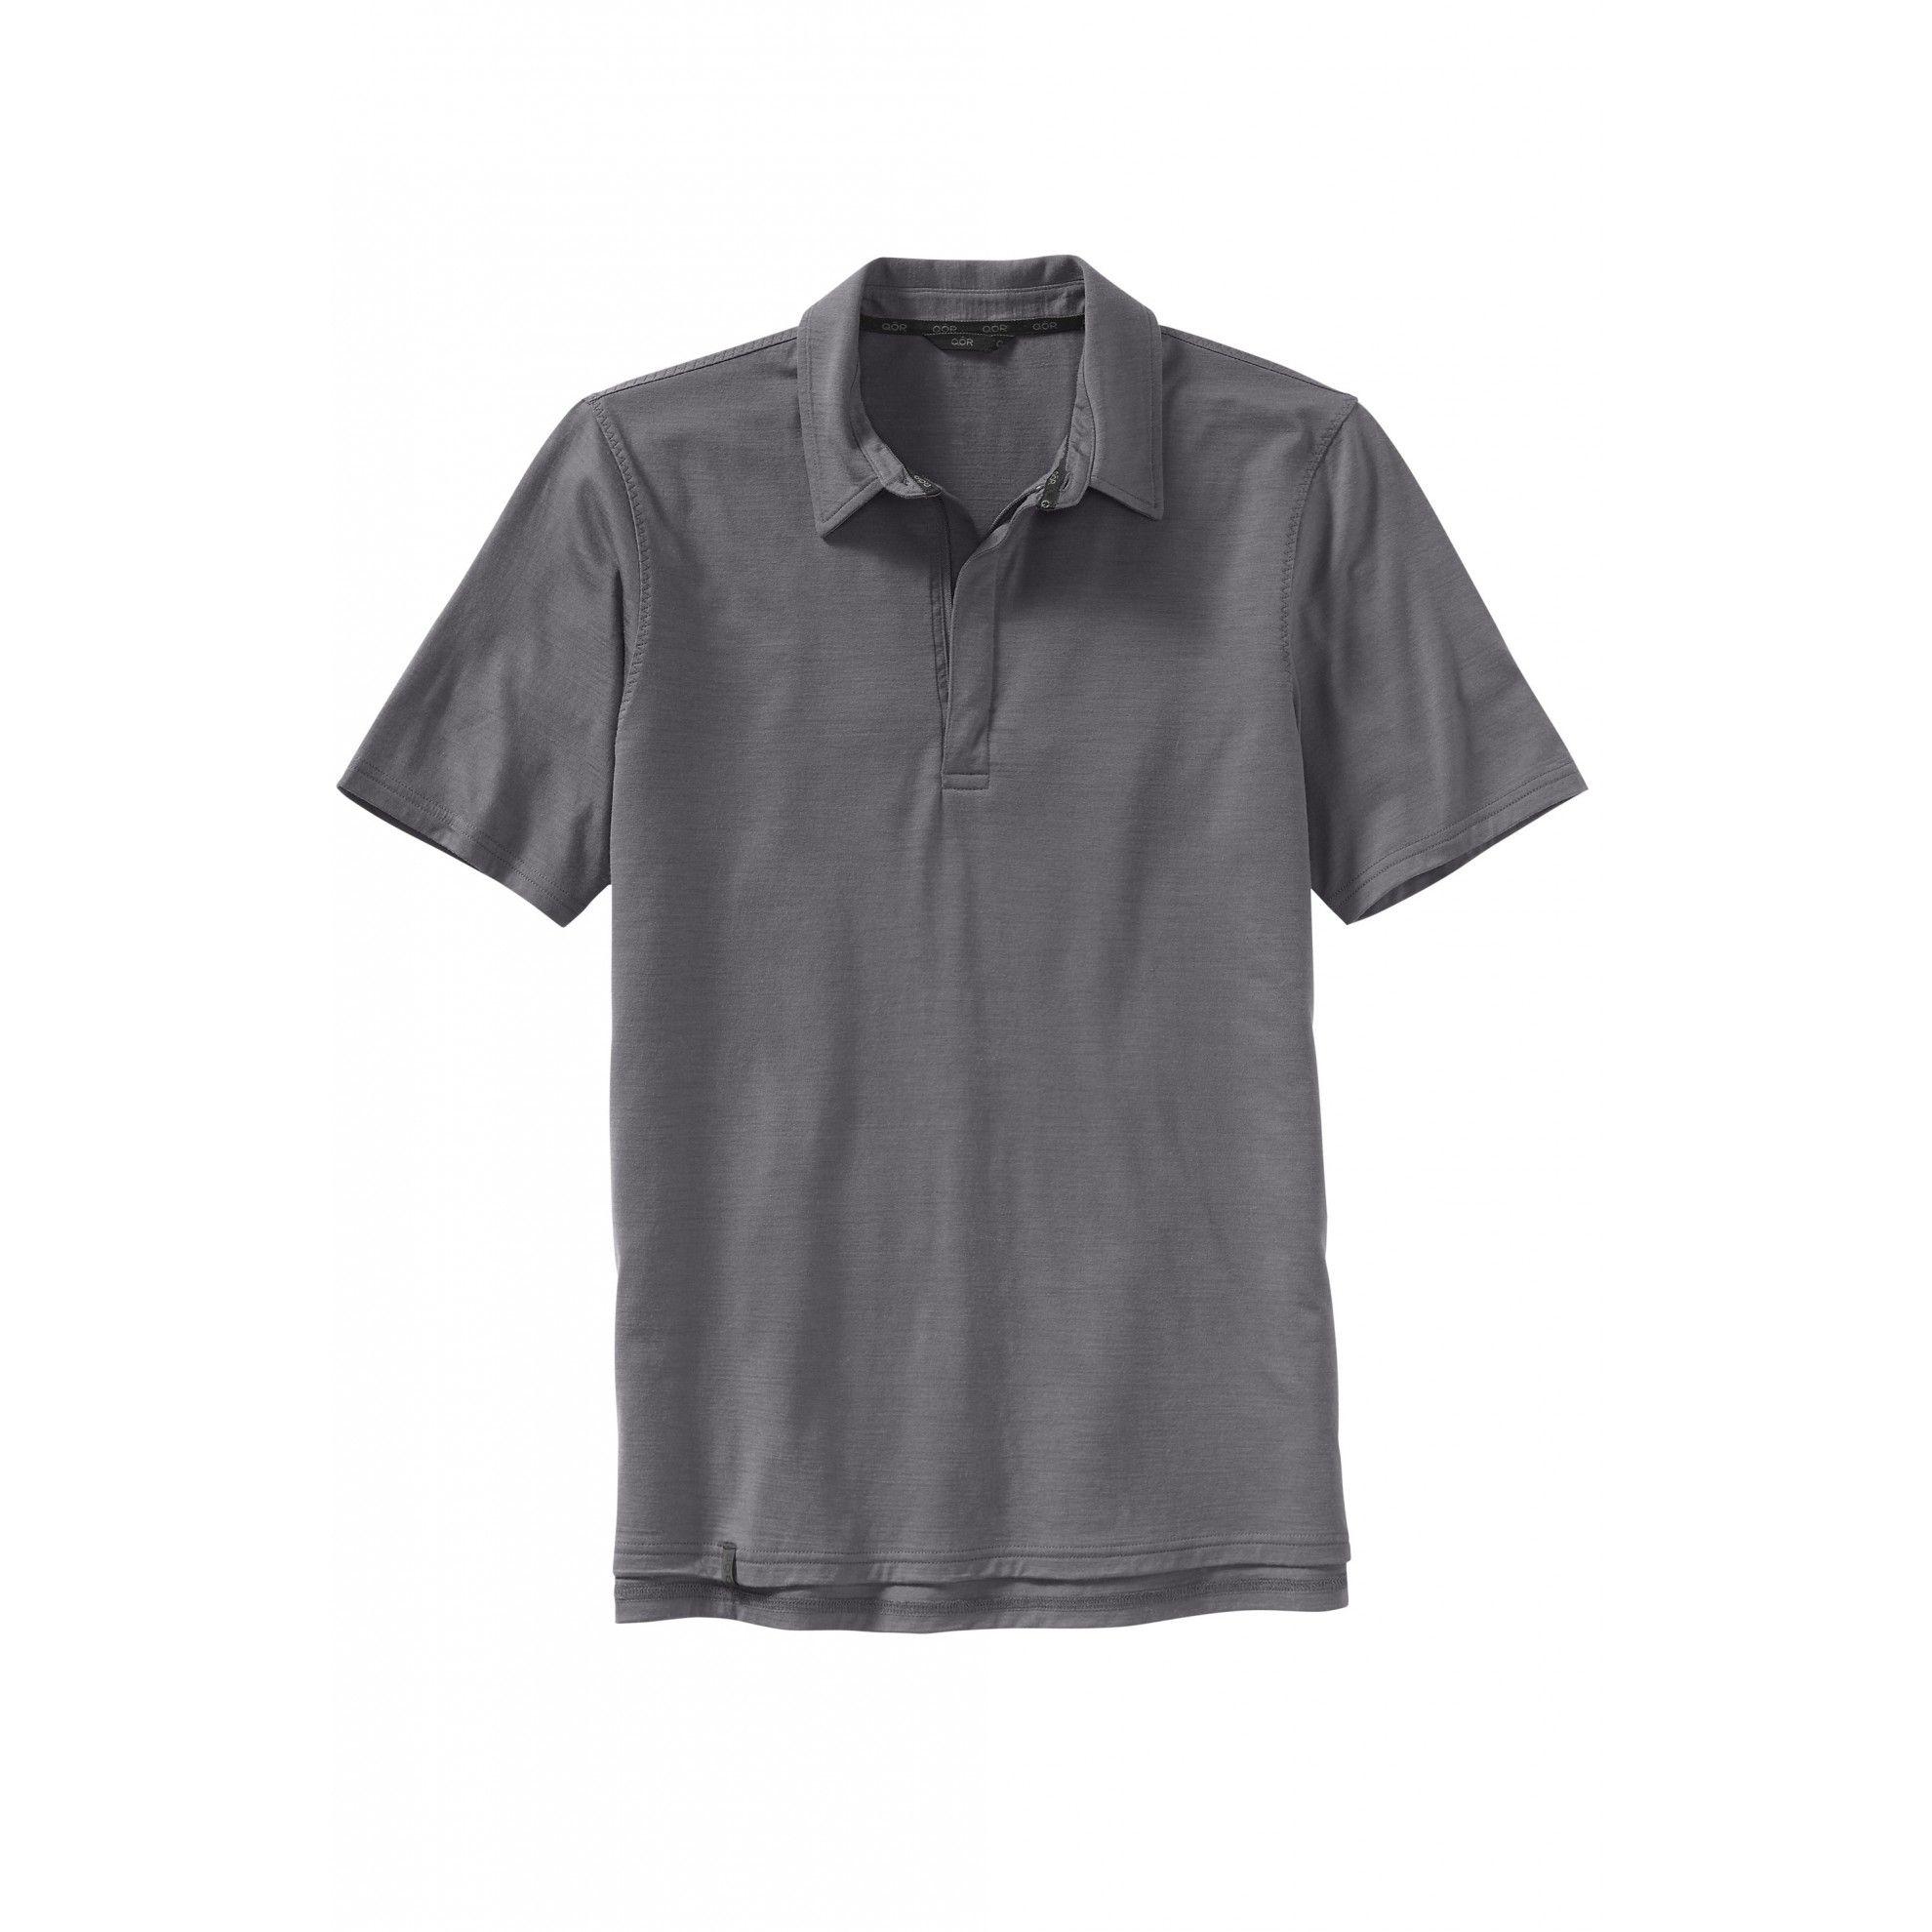 3a2aa6c4f 17.5 Merino Wool Polo Shirt